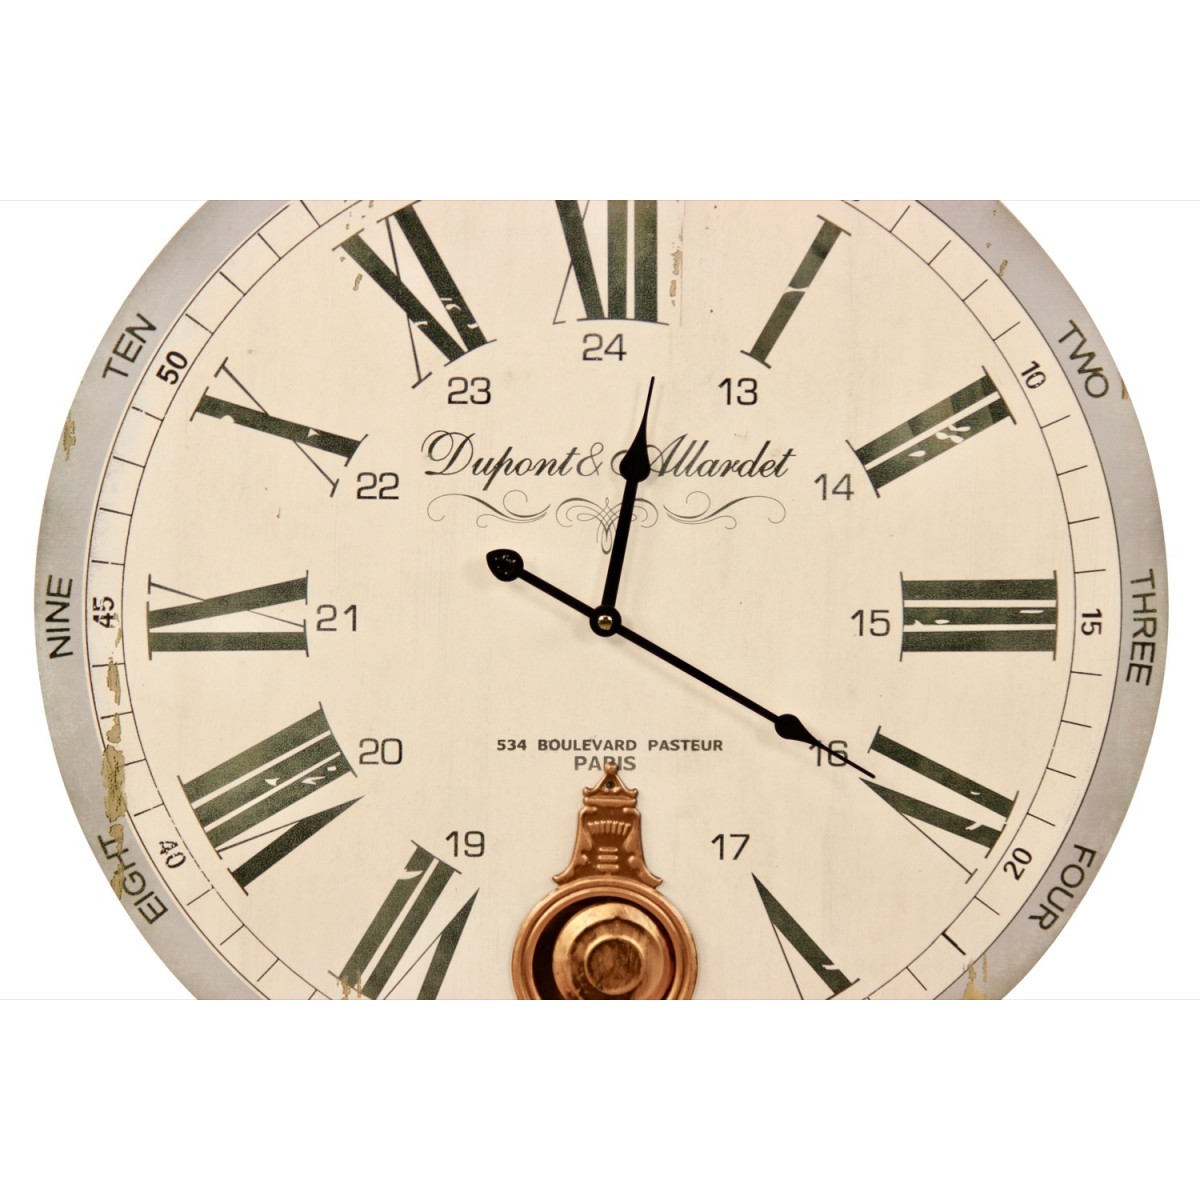 Horloge Ancienne Balancier Dupont & Allardet Blanc 58cm